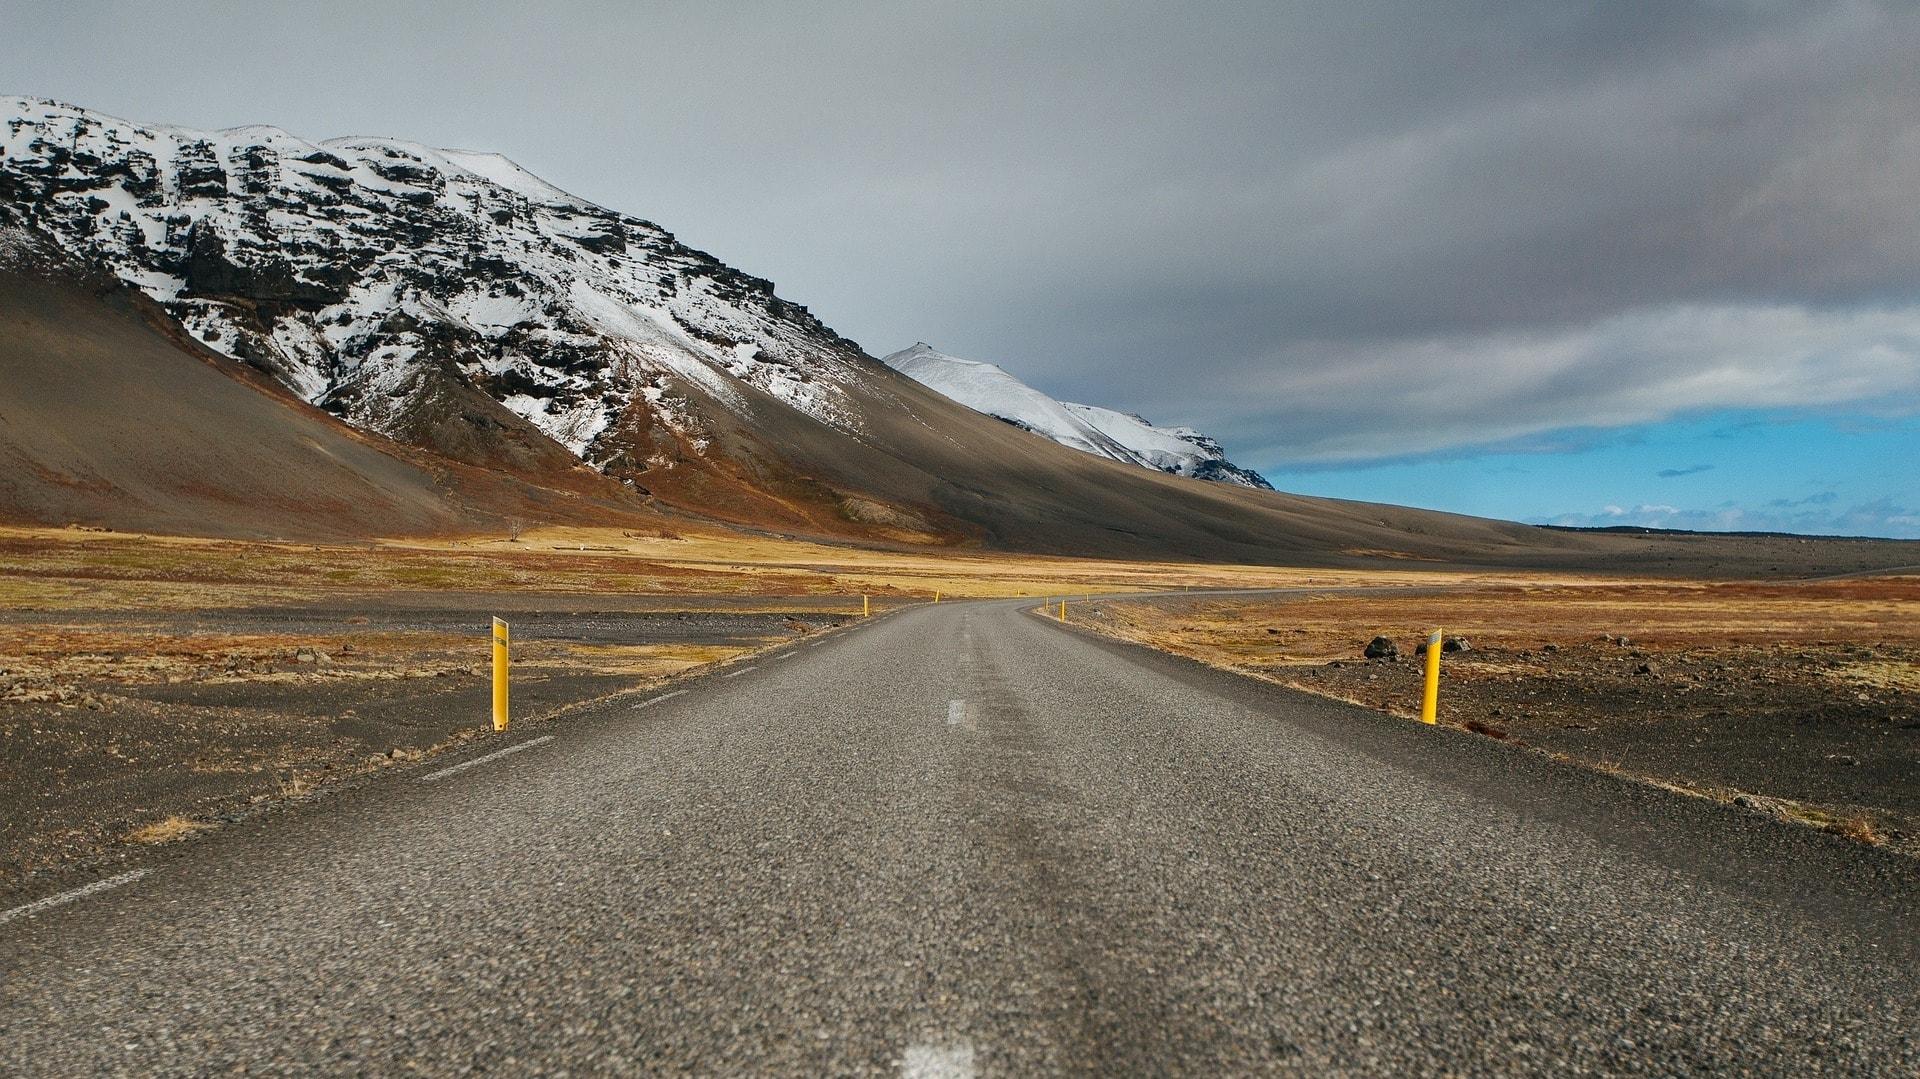 Die Ringstraße ist die Hauptverkehrsstraße auf Island. Sie führt einmal um die komplette Insel herum.